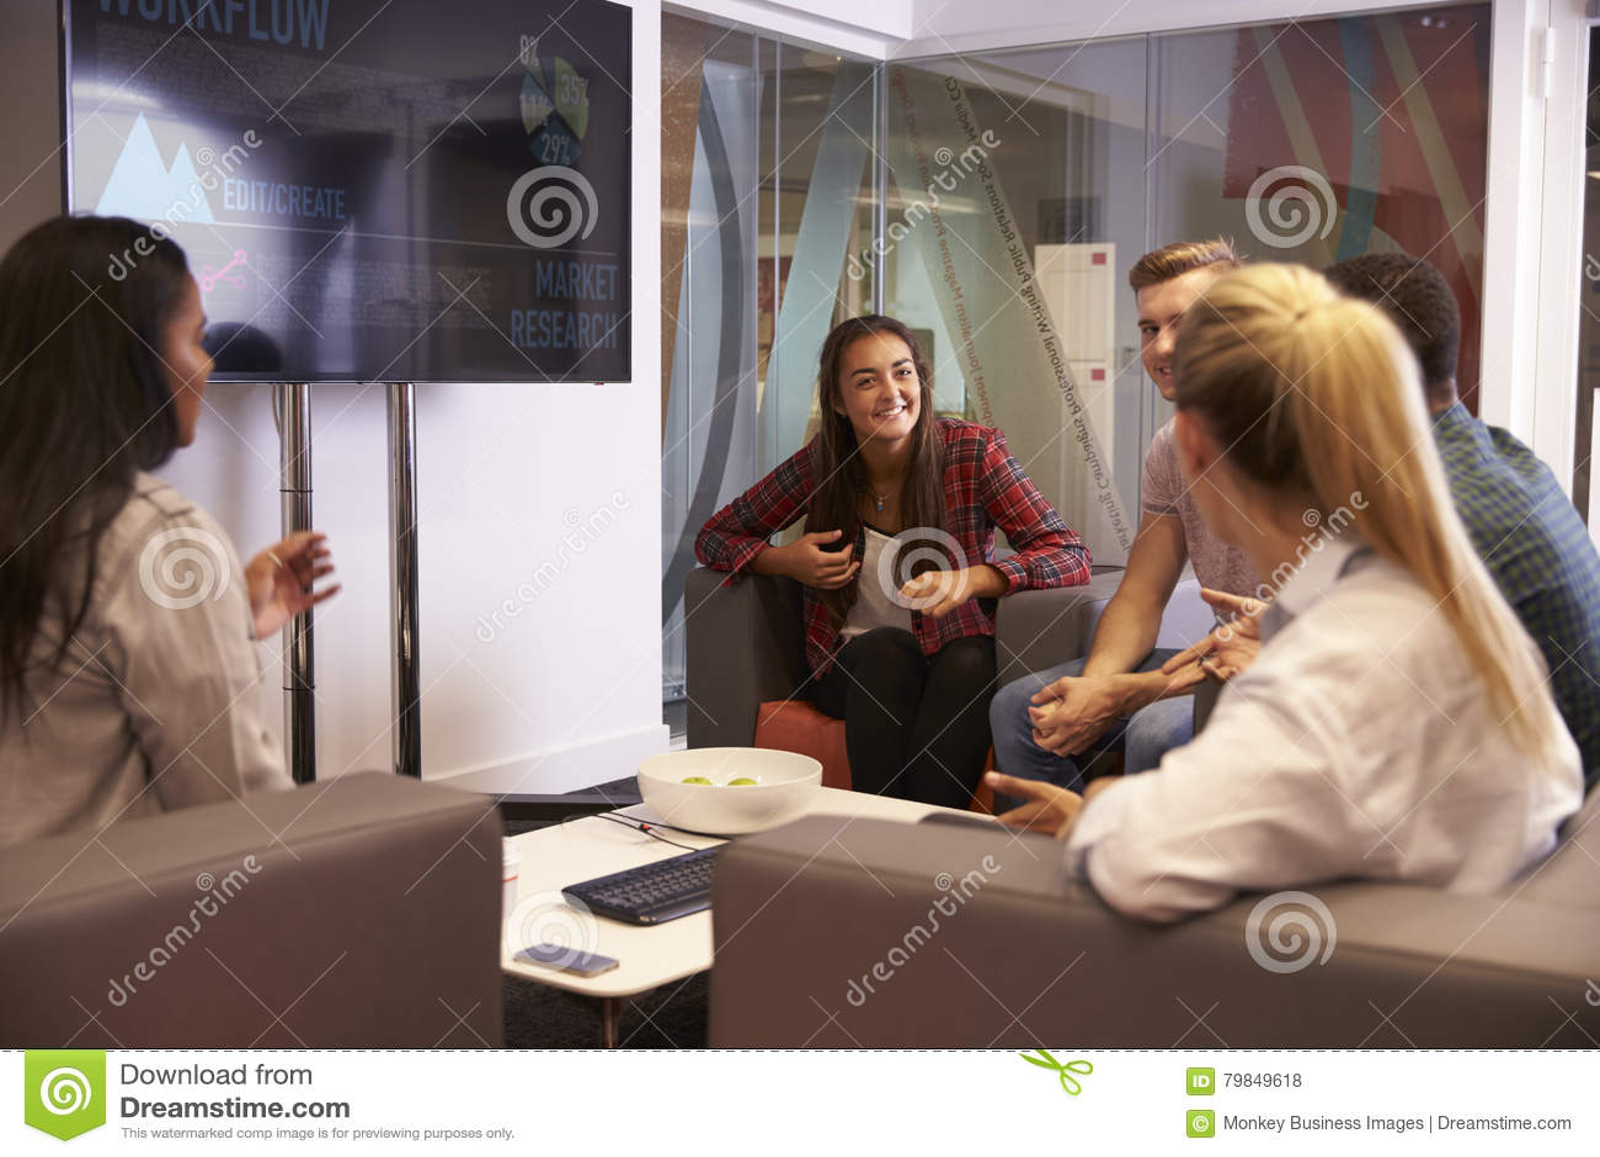 Grupo de estudiantes universitarios que discuten proyecto junto